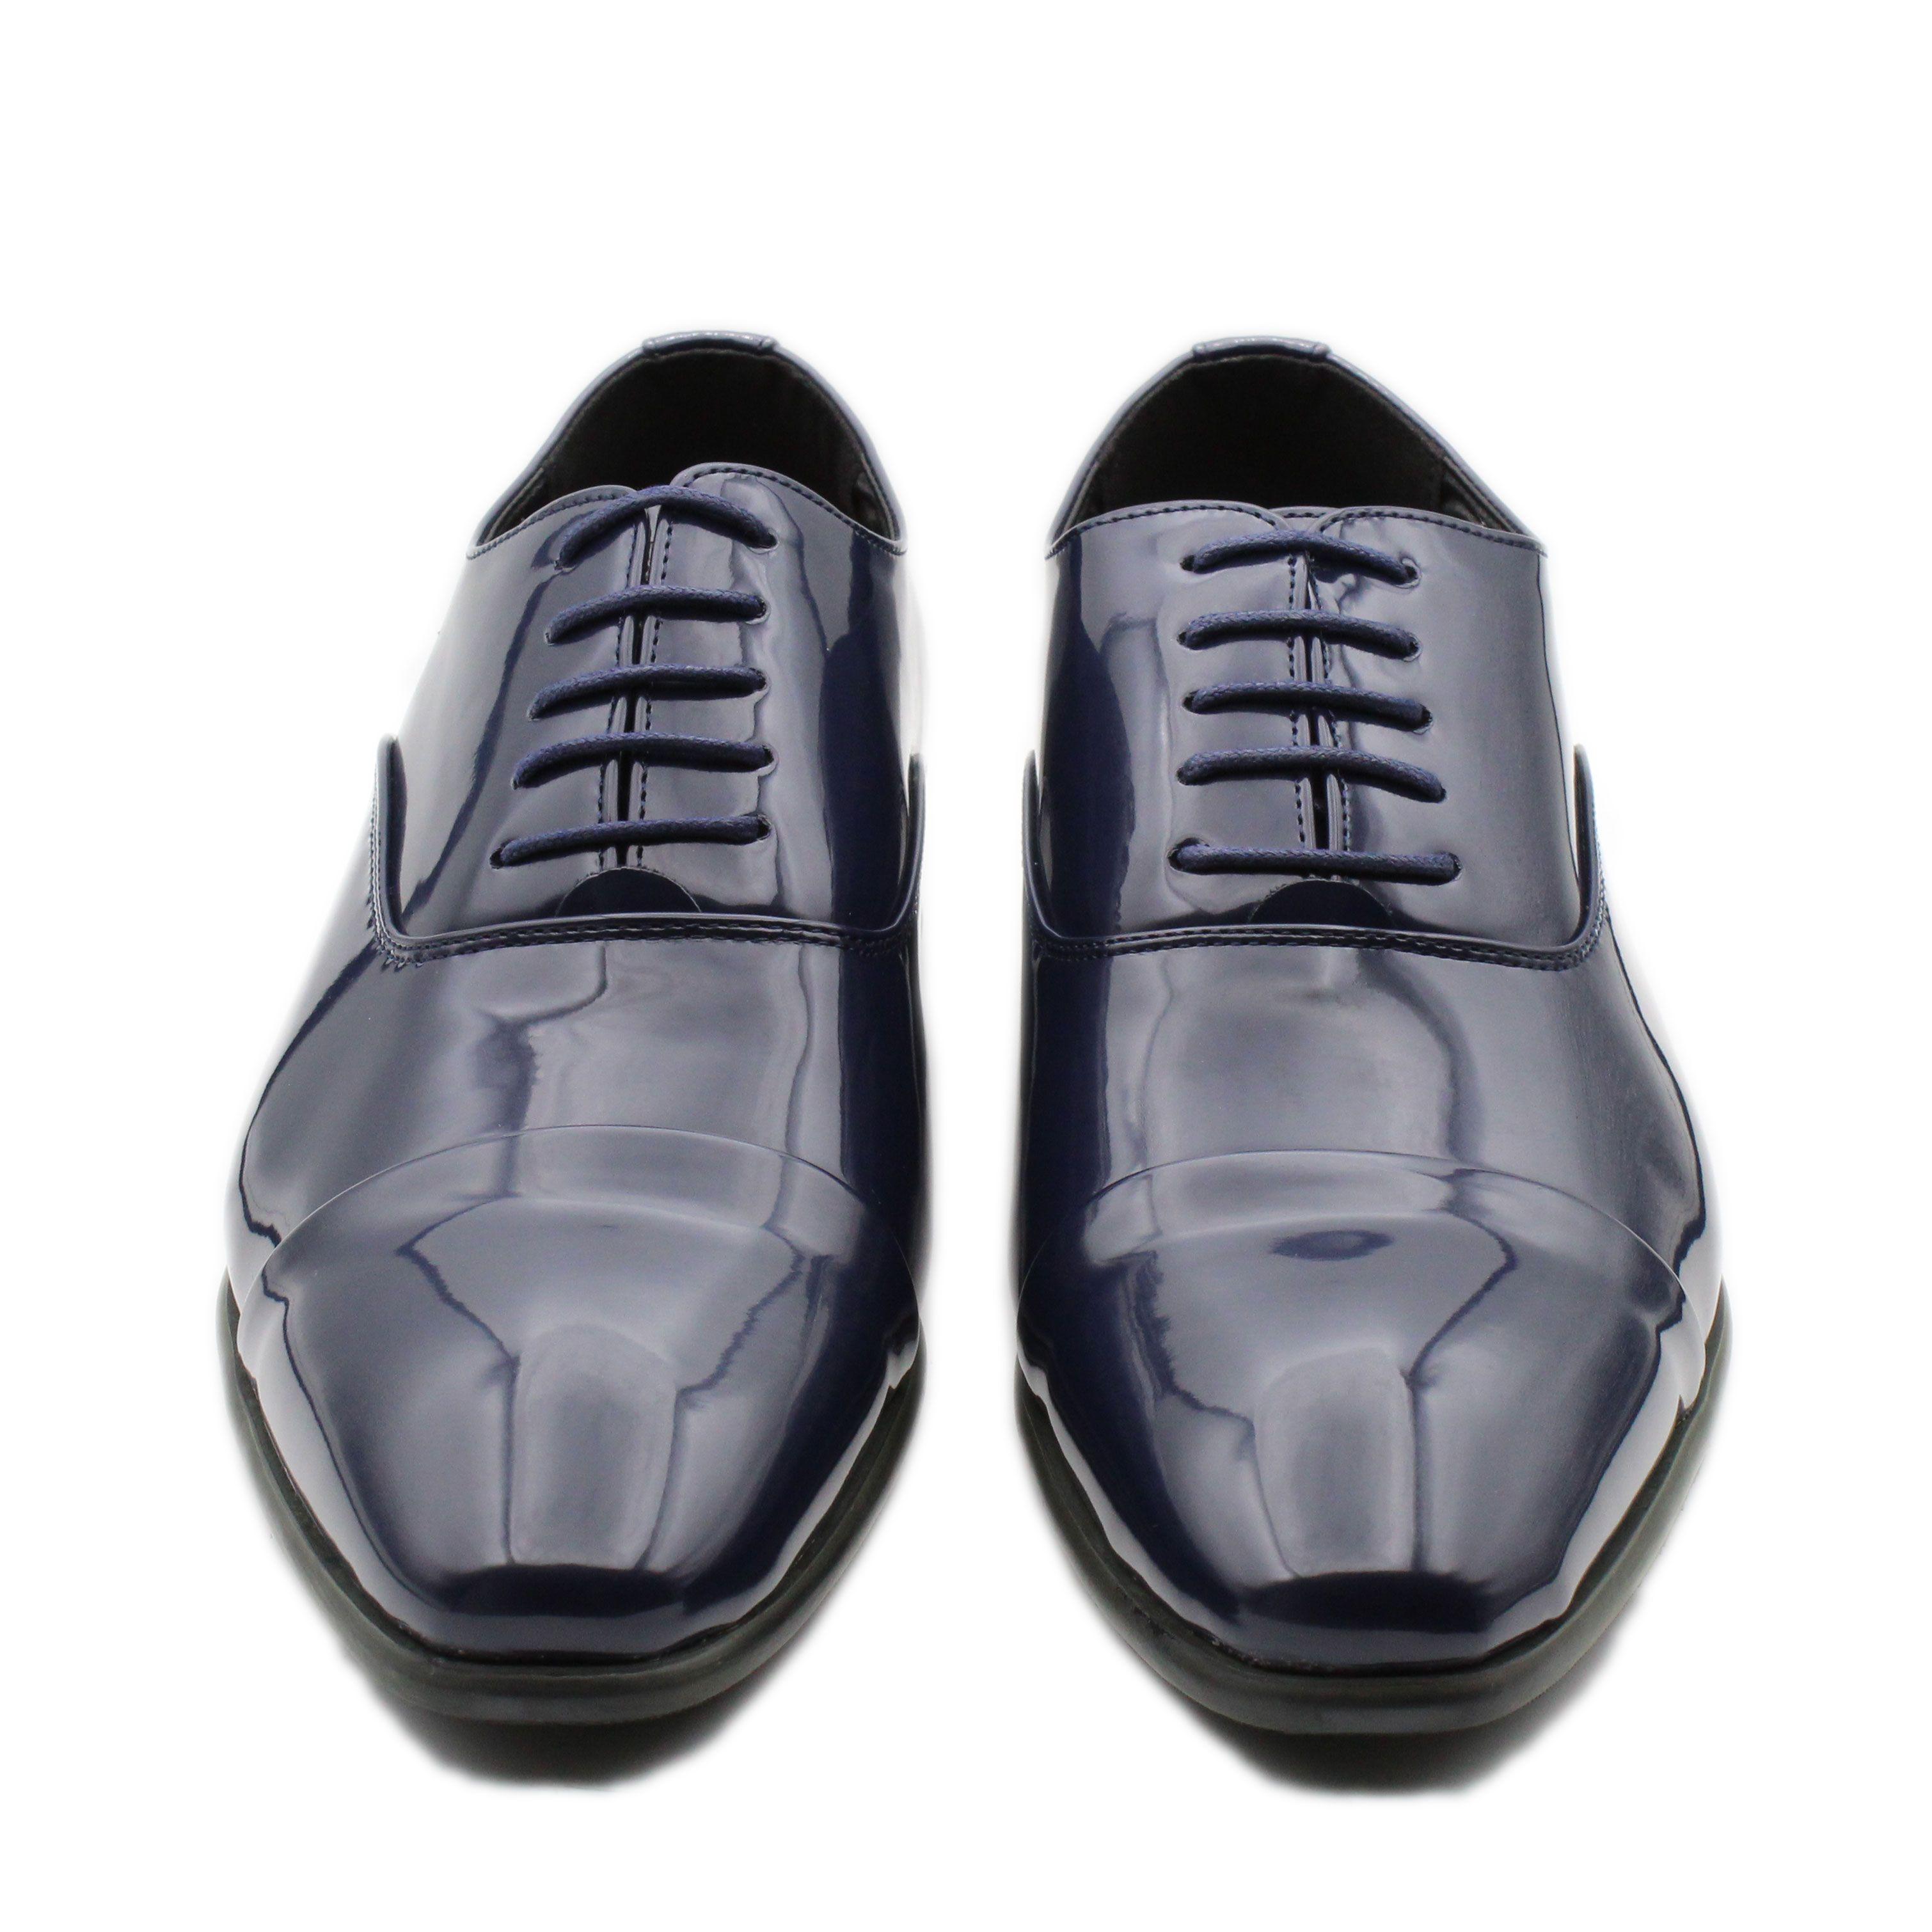 Scarpe-Uomo-Eleganti-Lucide-Blu-Nere-Francesine-Classiche-Cerimonia-Oxford miniatura 4